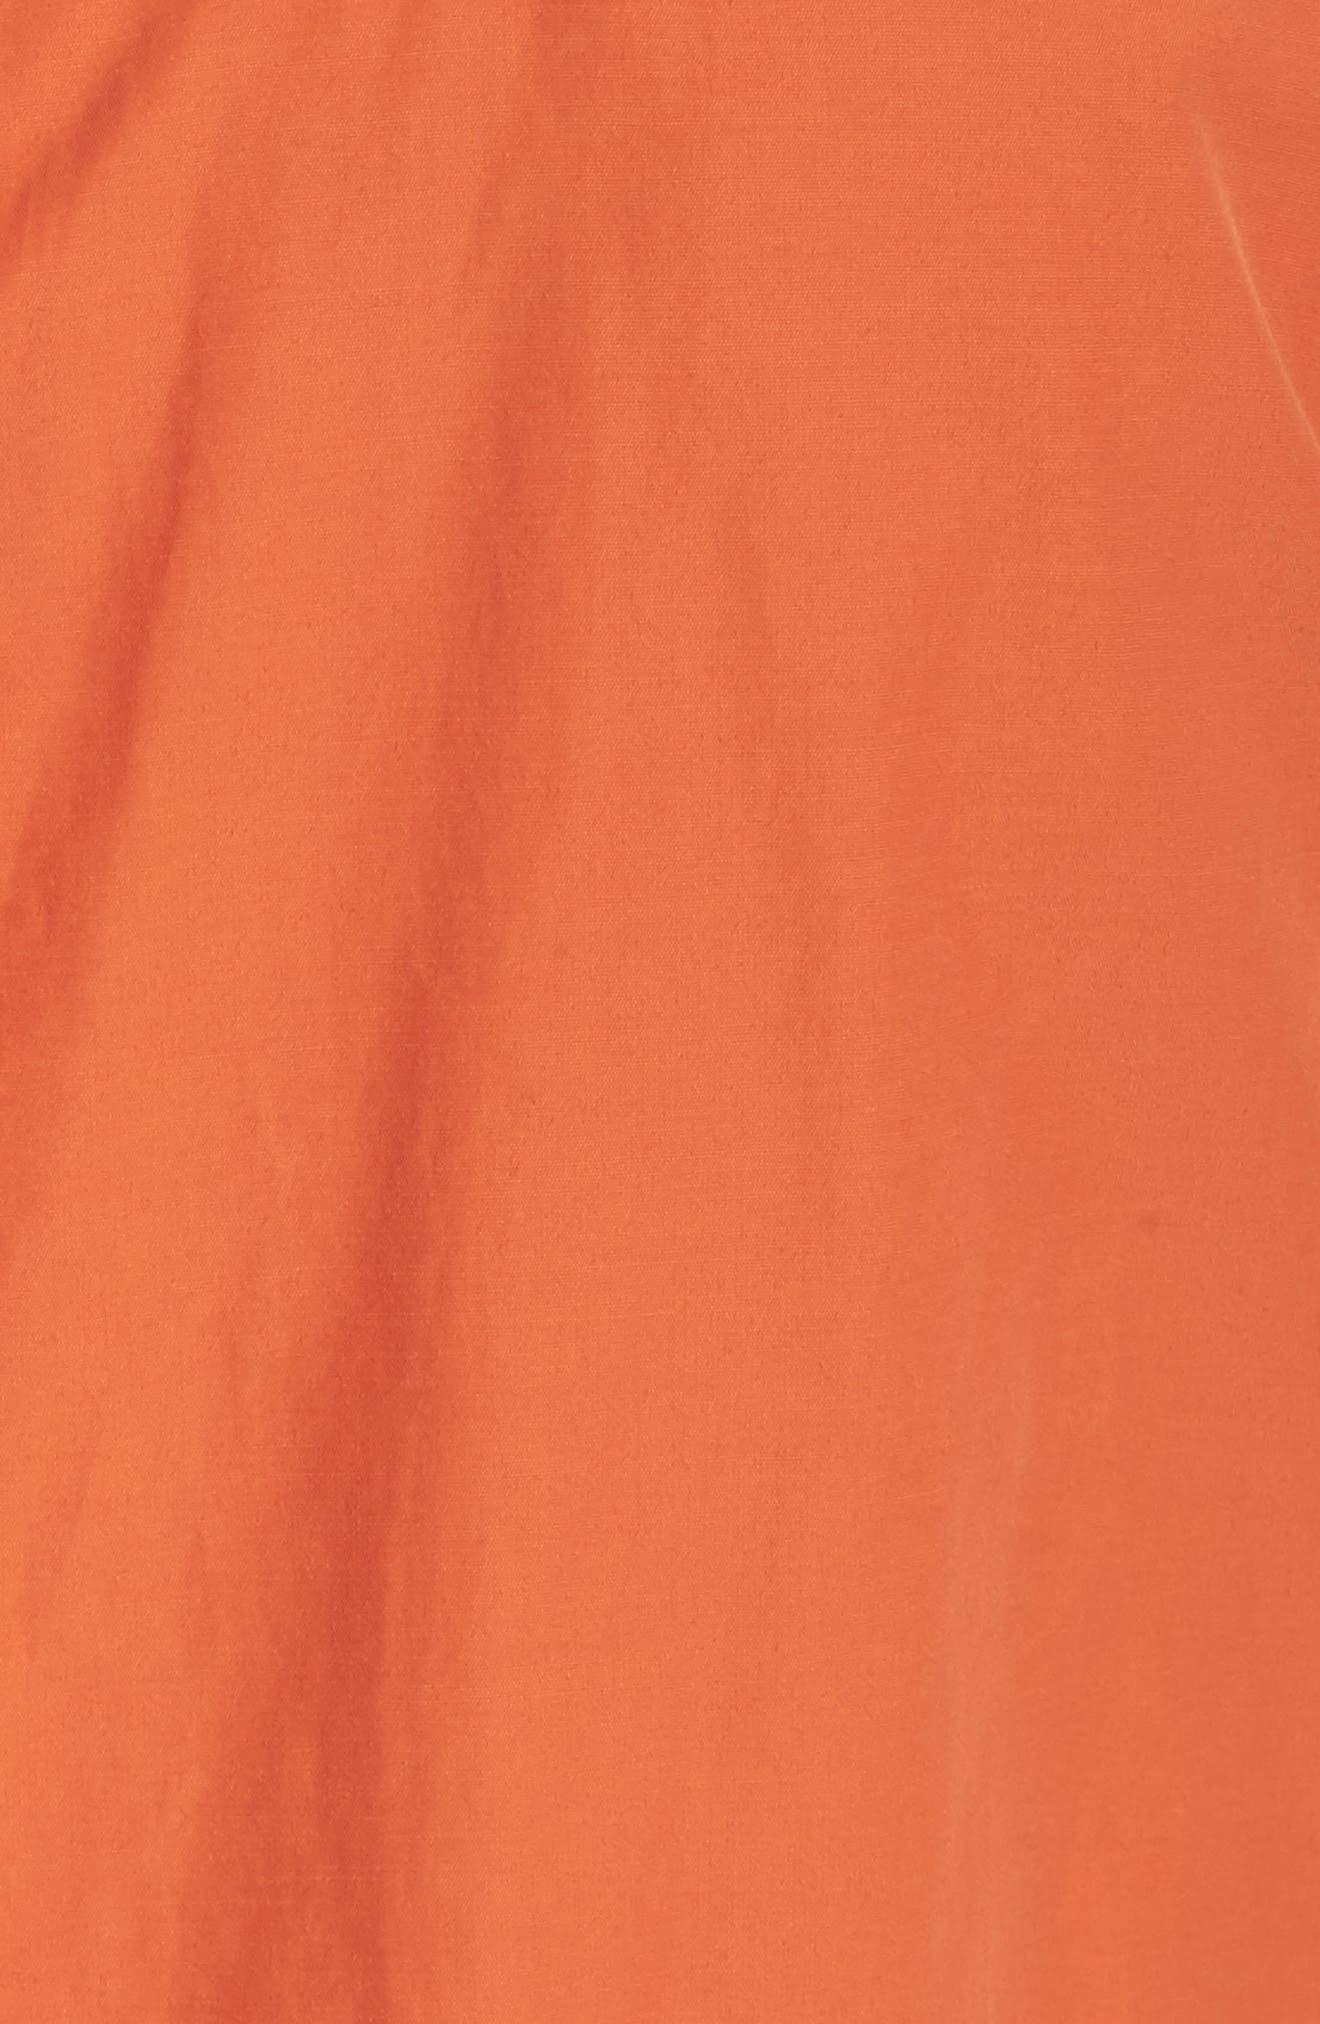 Hooded Organic Cotton Blend Jacket,                             Alternate thumbnail 6, color,                             001